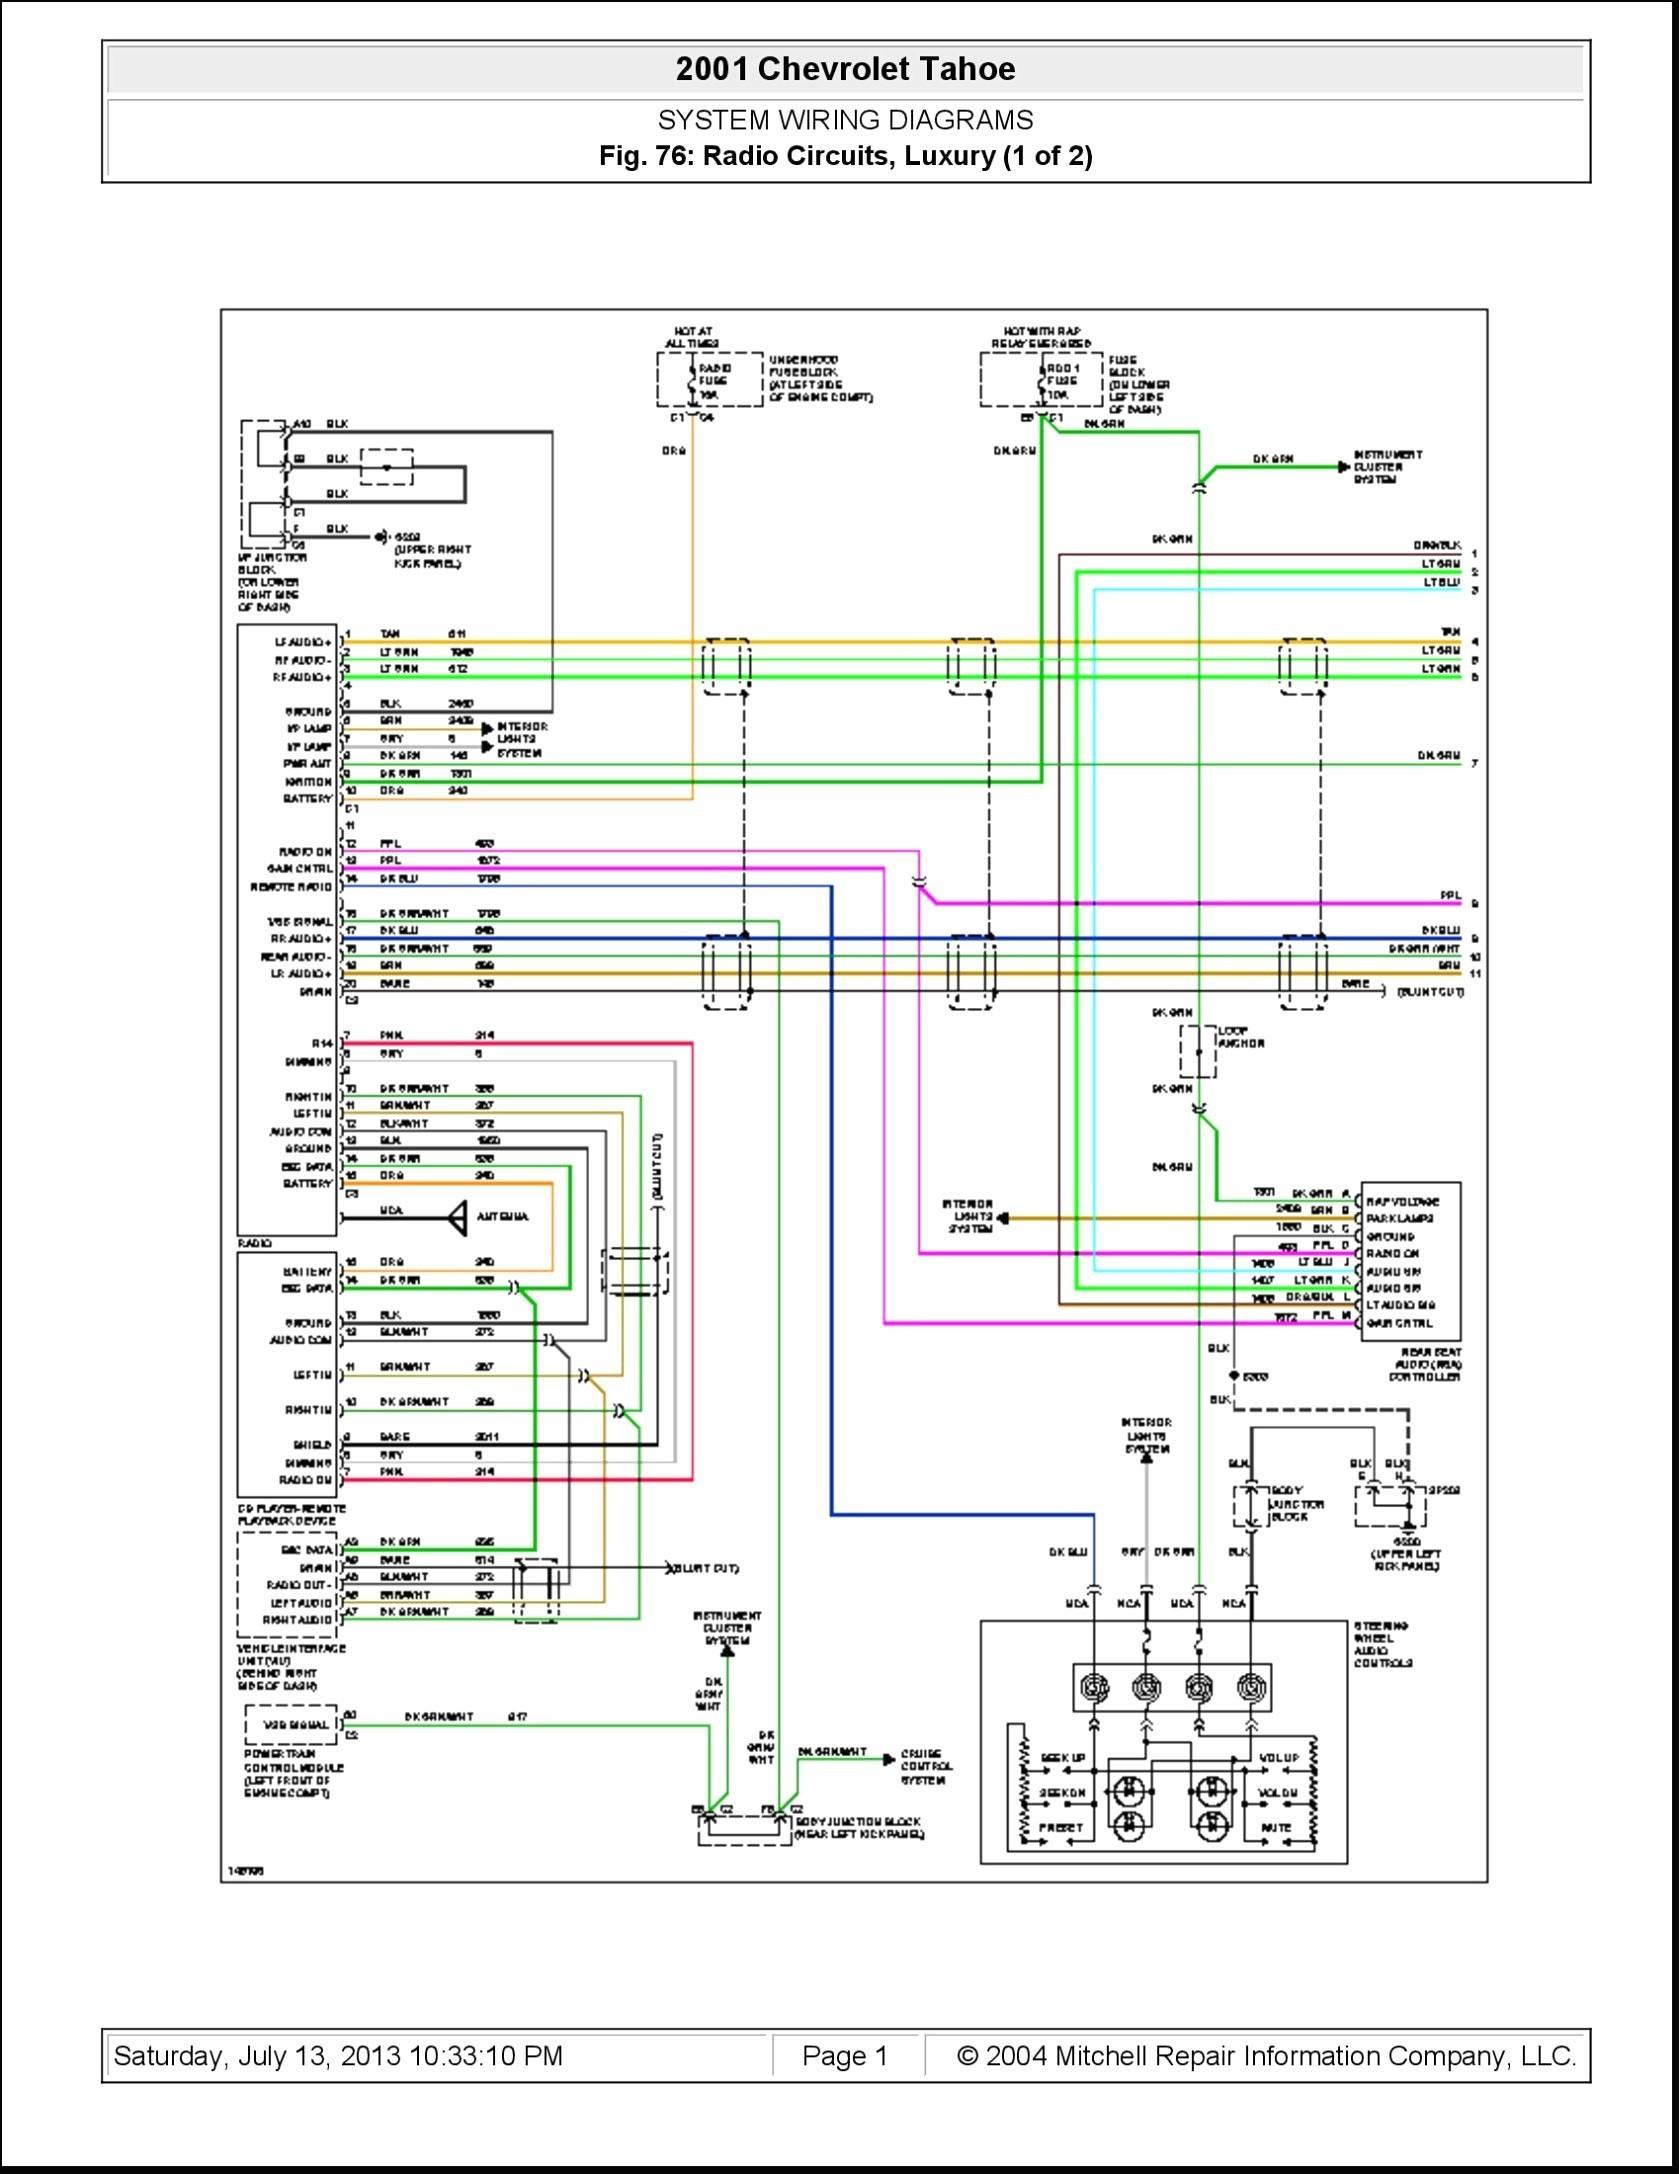 2001 Chevy Impala 3 8 Engine Diagram 2003 Stereo Wiring 2008 Radio Simple 2004